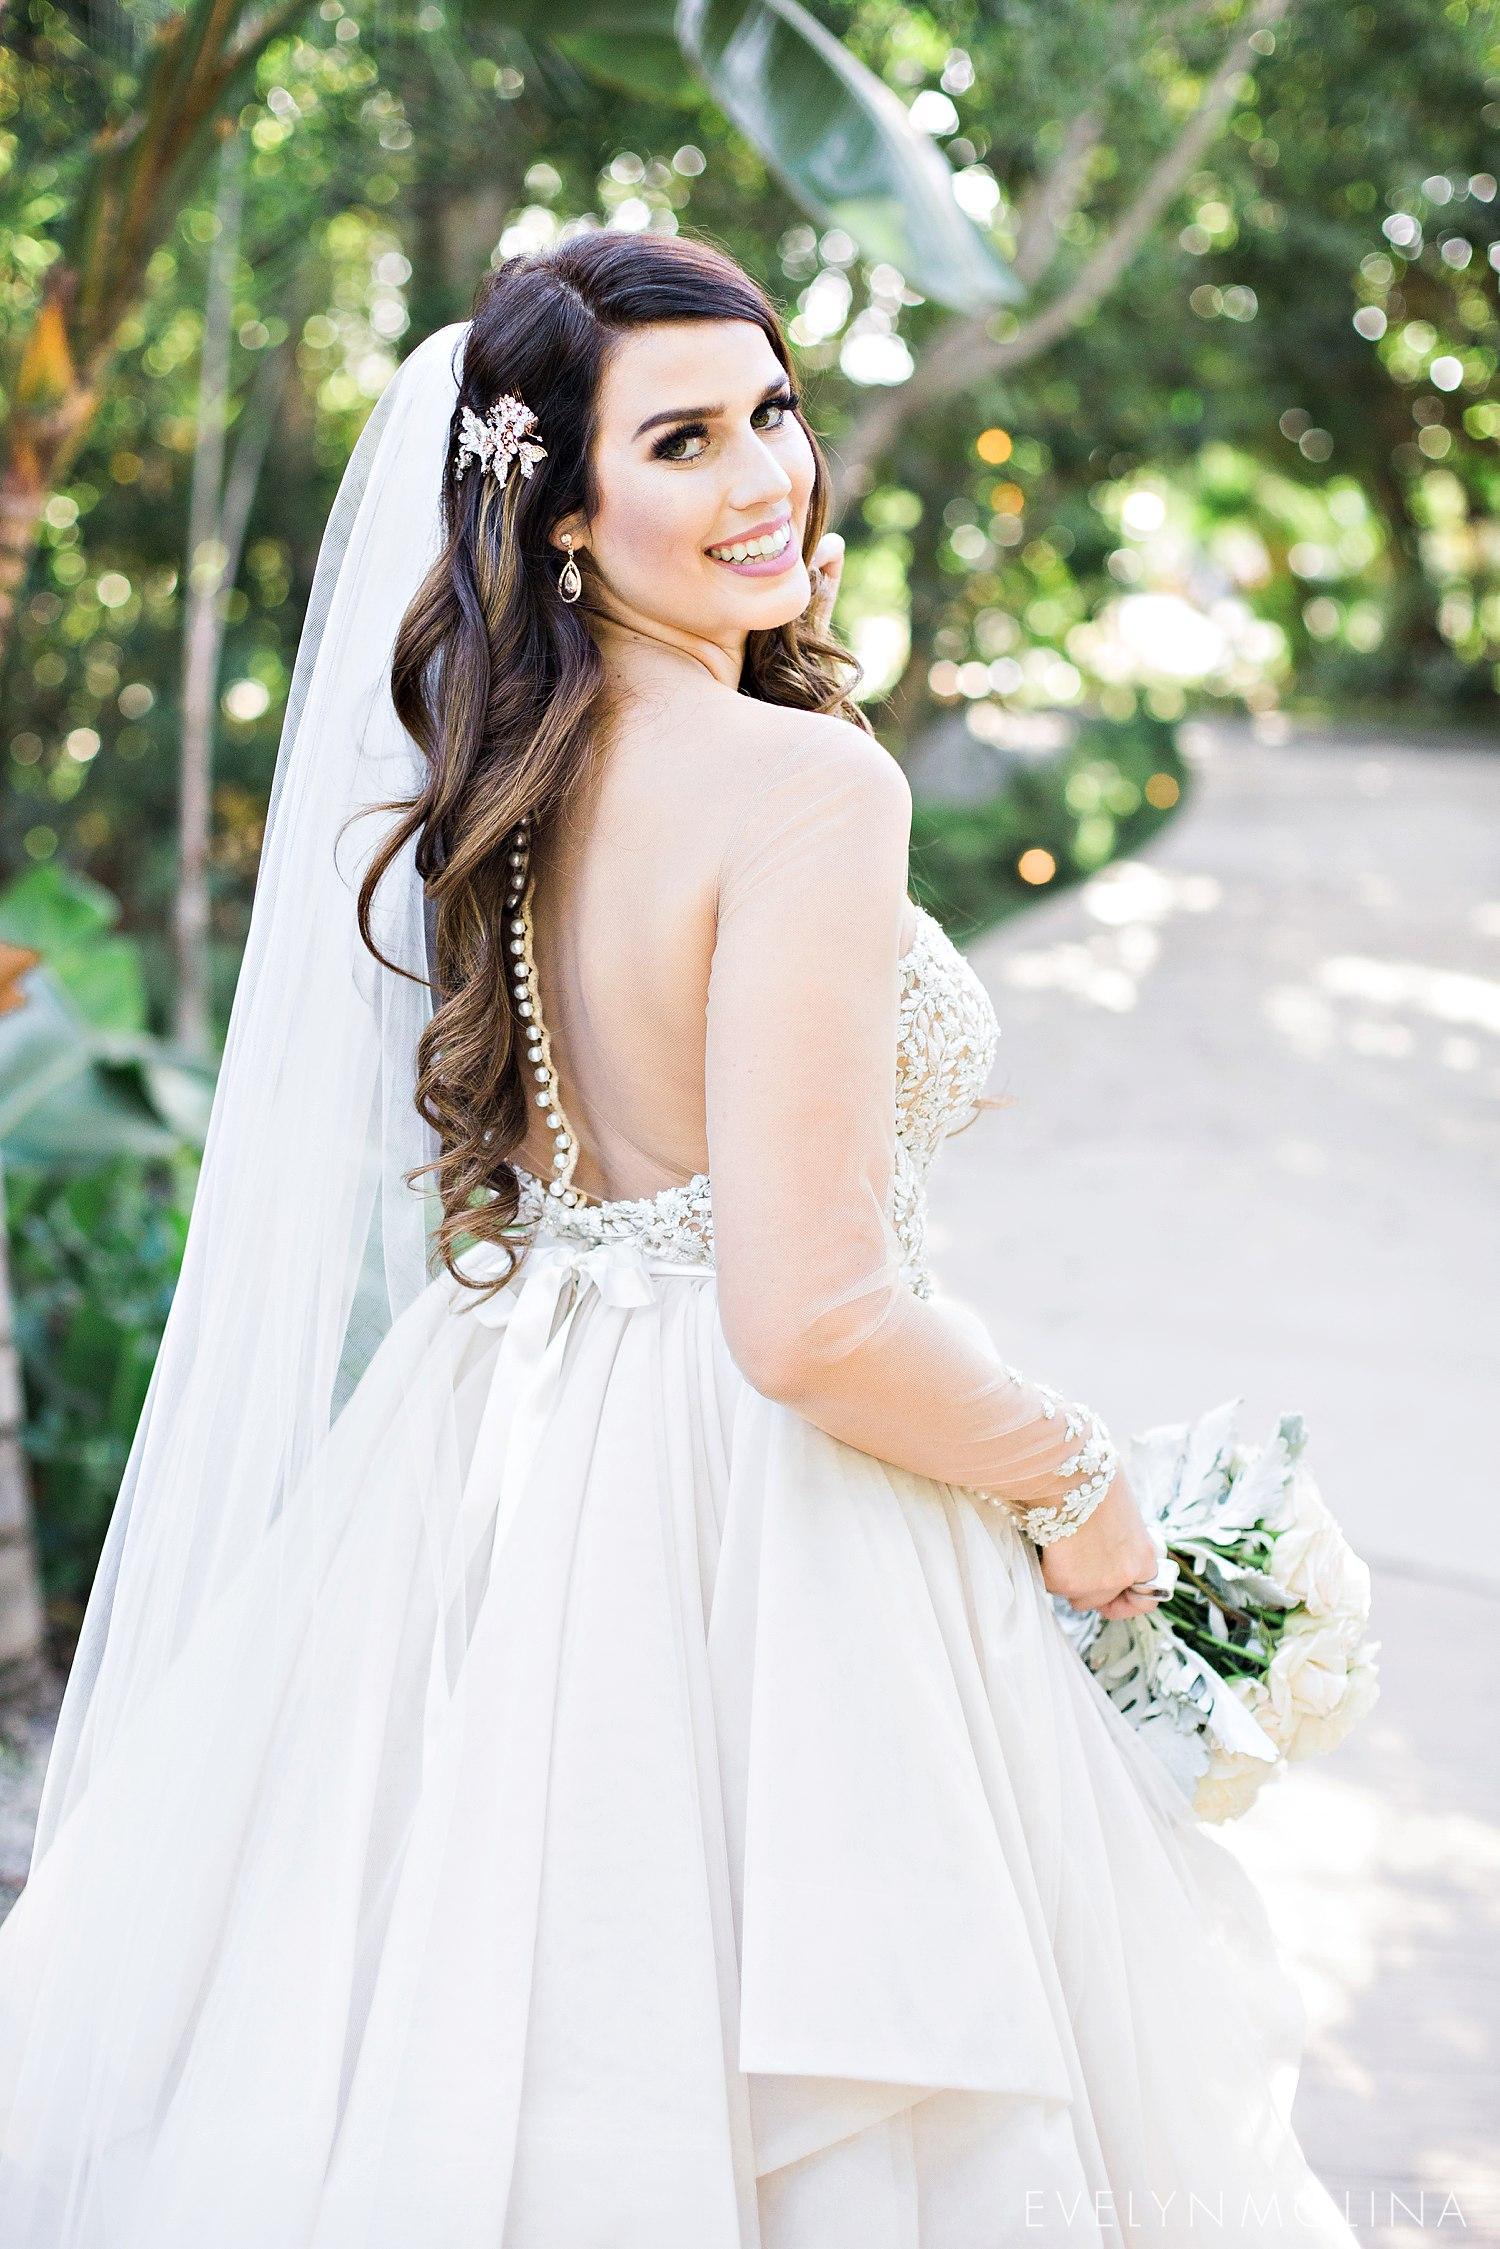 Paradise Falls Summer Wedding - Samantha and Cliff_007.jpg